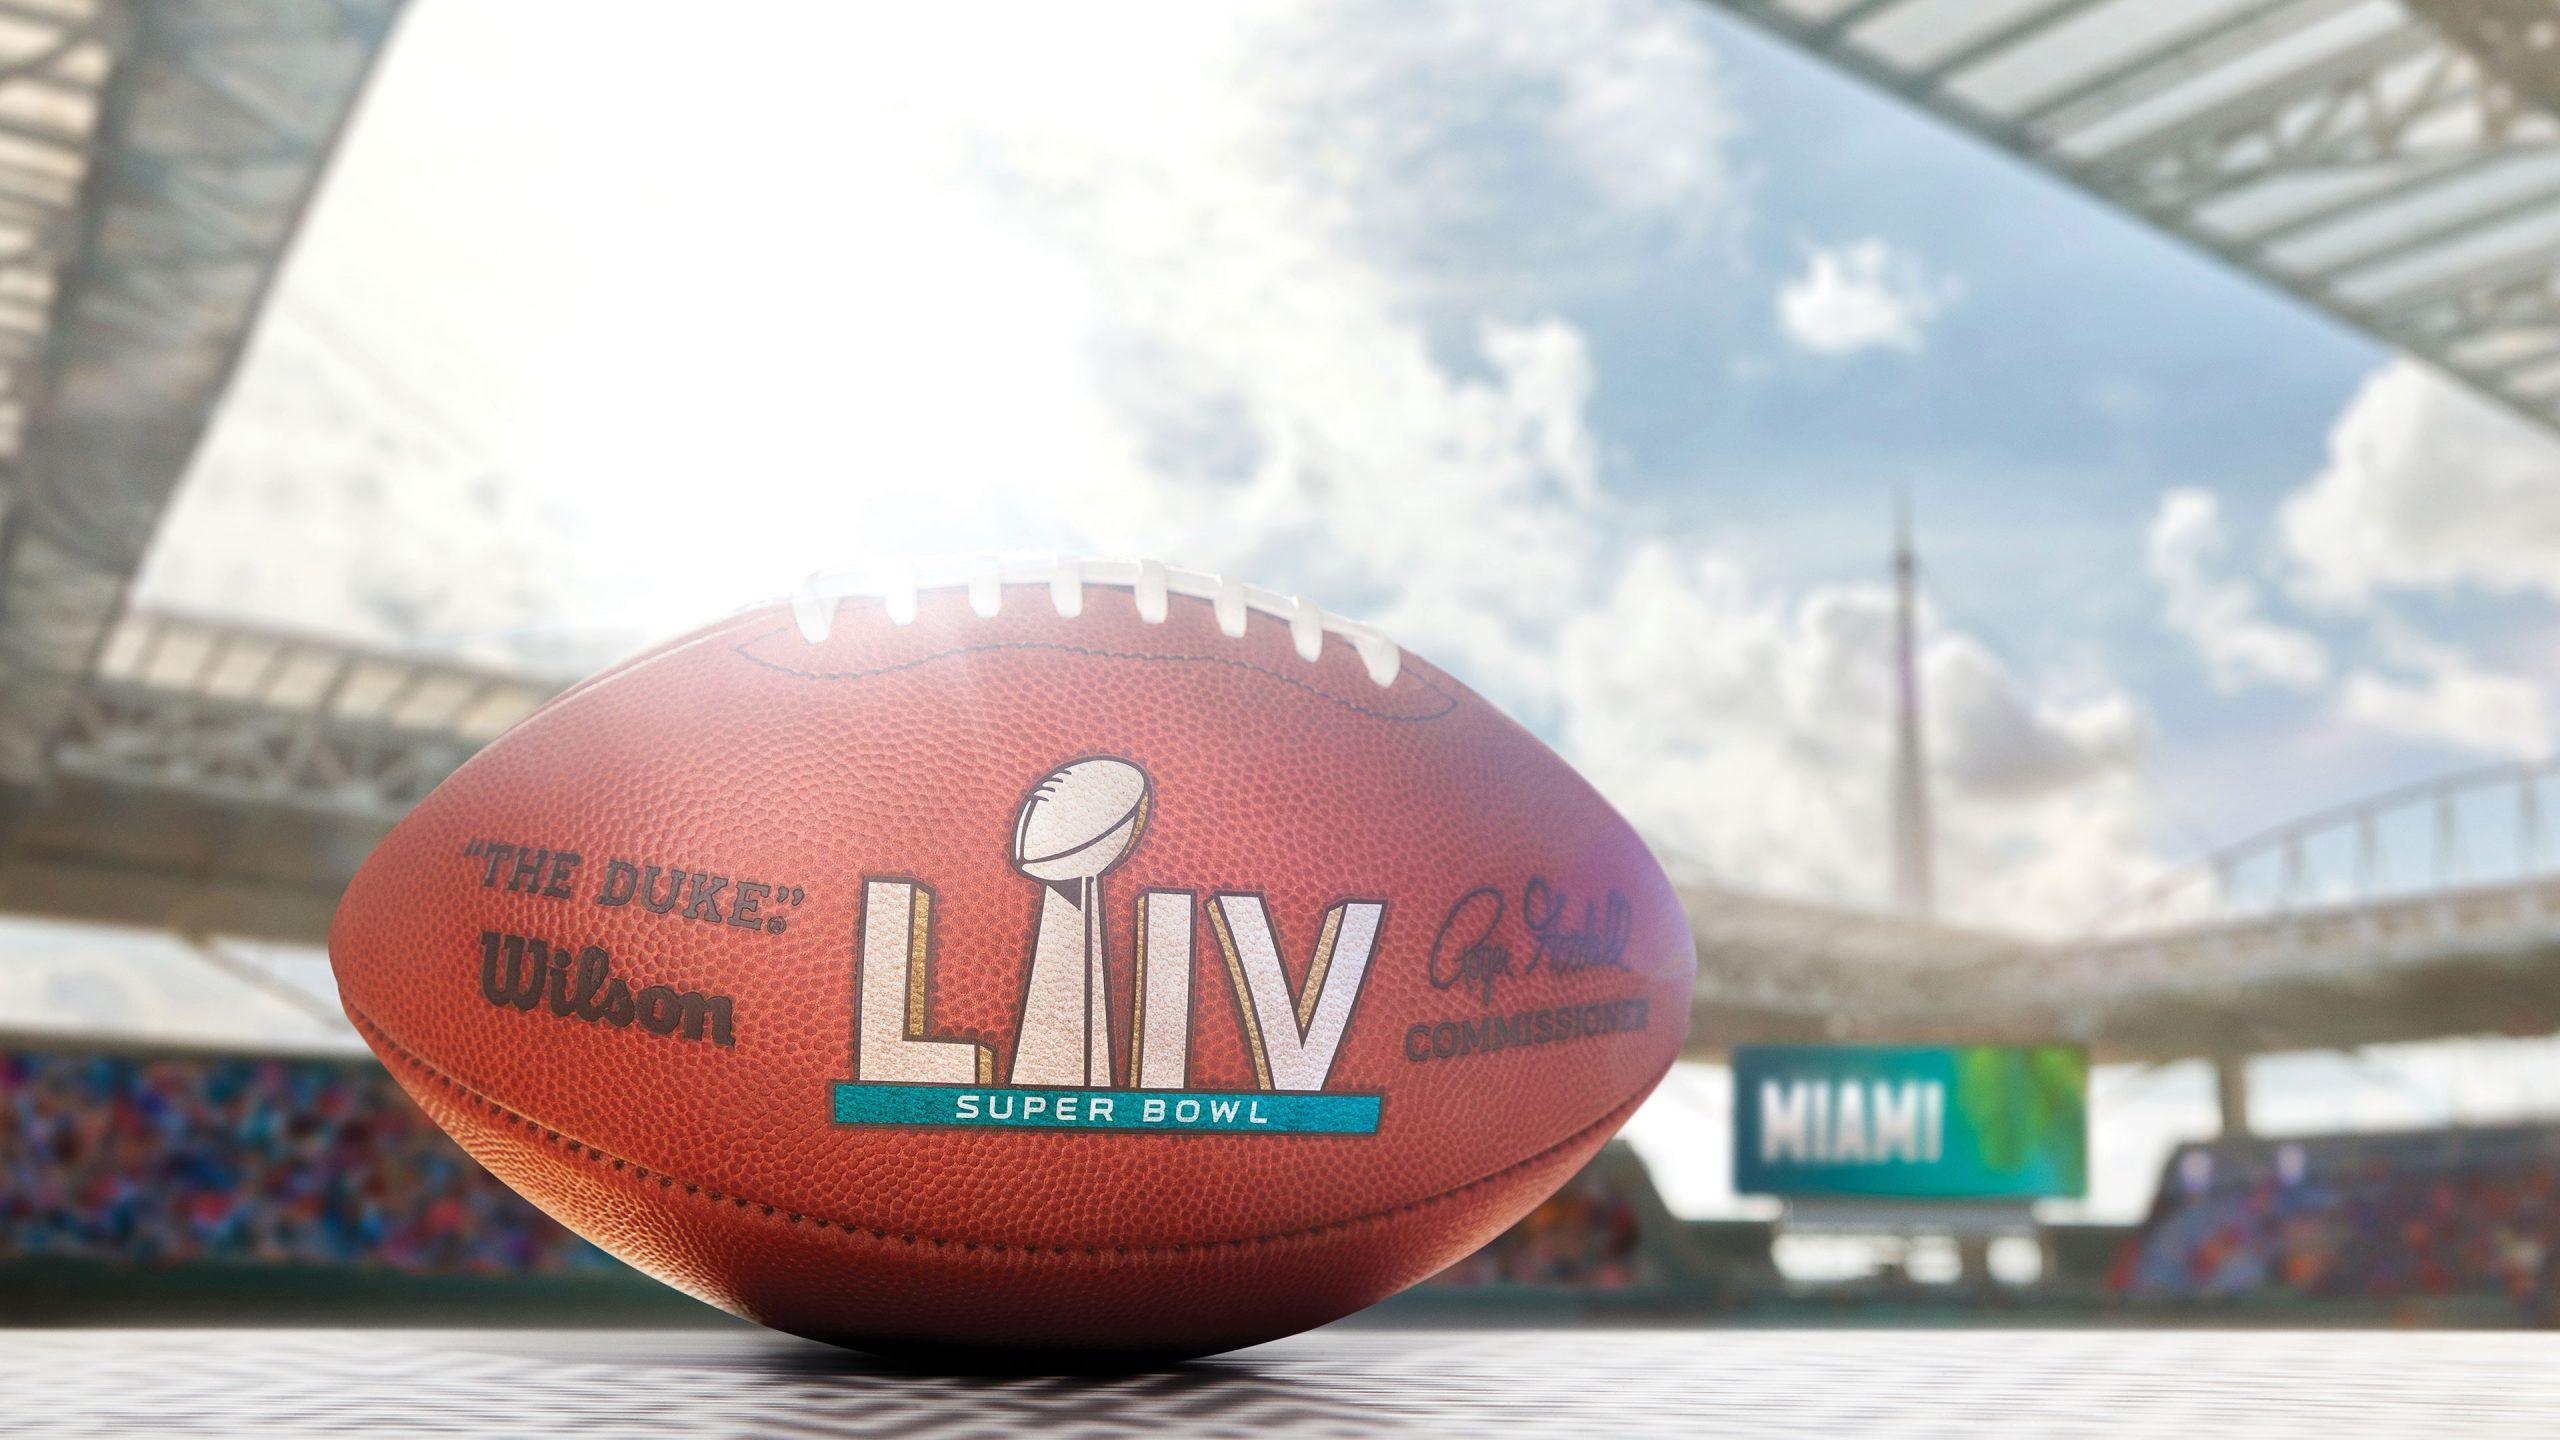 Super Bowl Opening Night | Nfl | Nfl regarding Miami Super Bowl Tickets